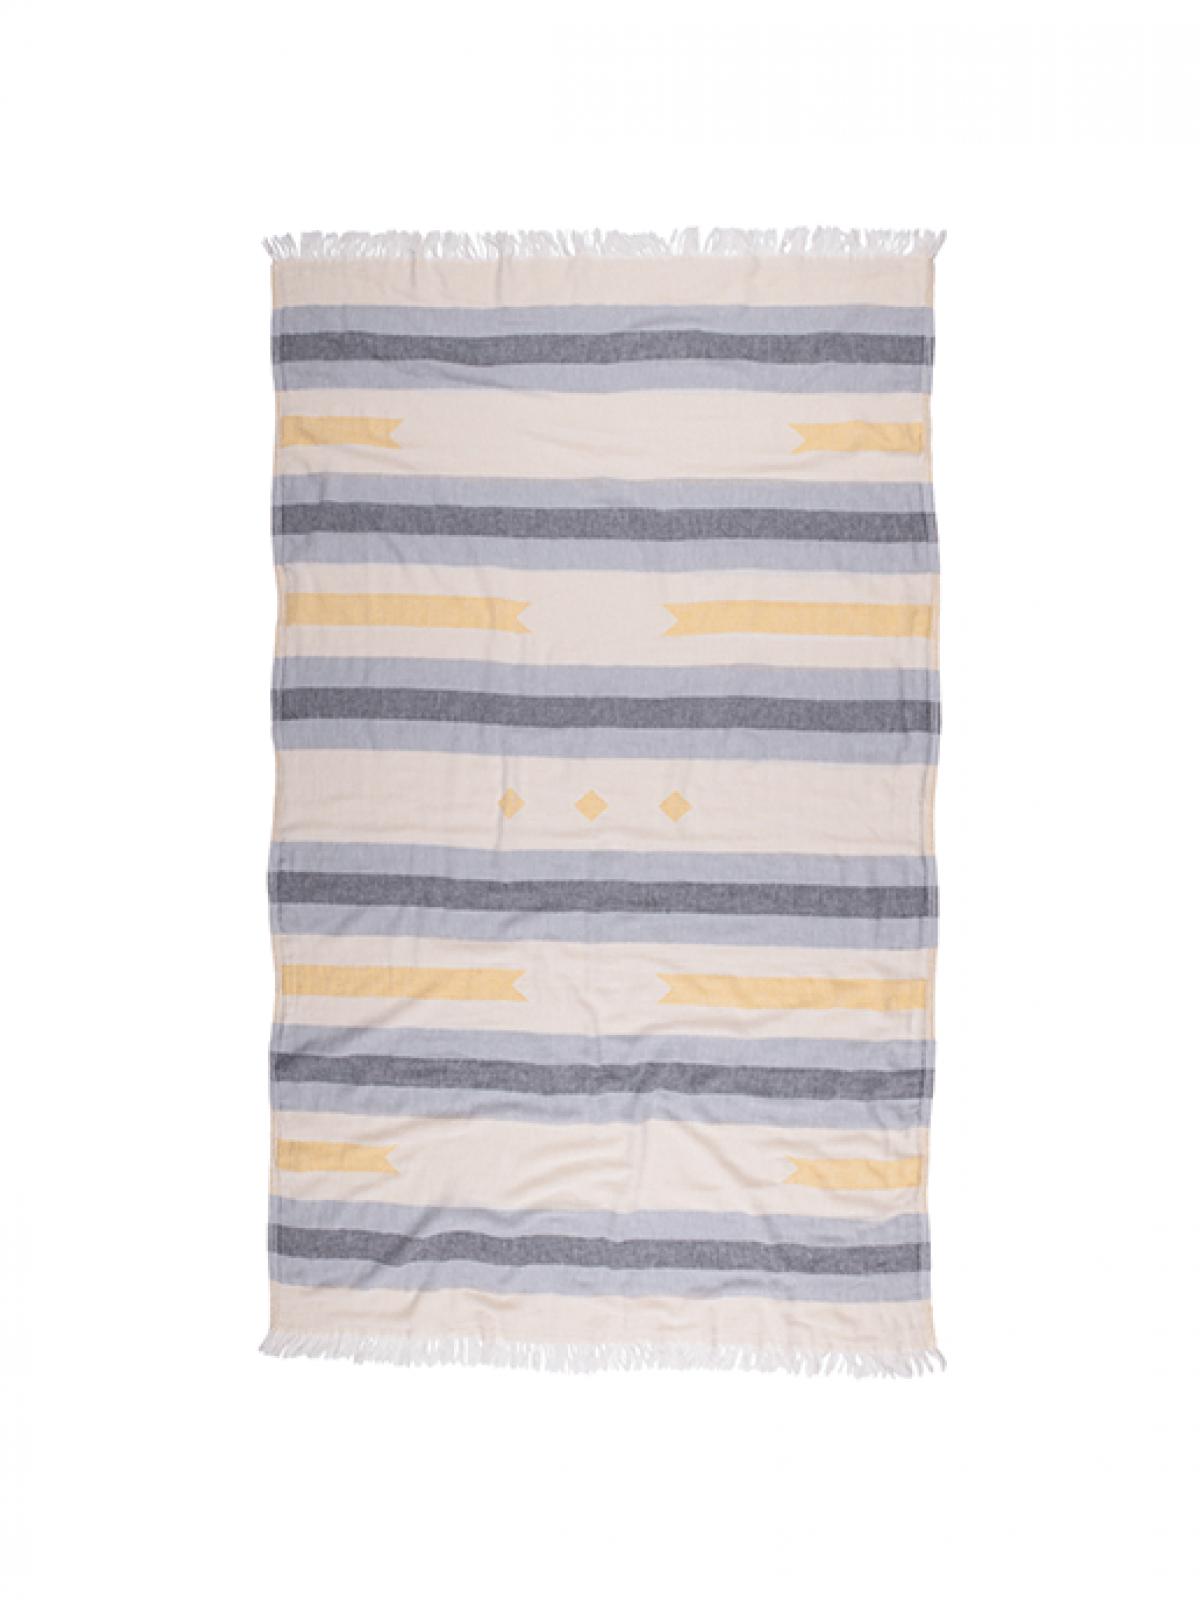 bedouin-pestemal-saffron-1200x1600h